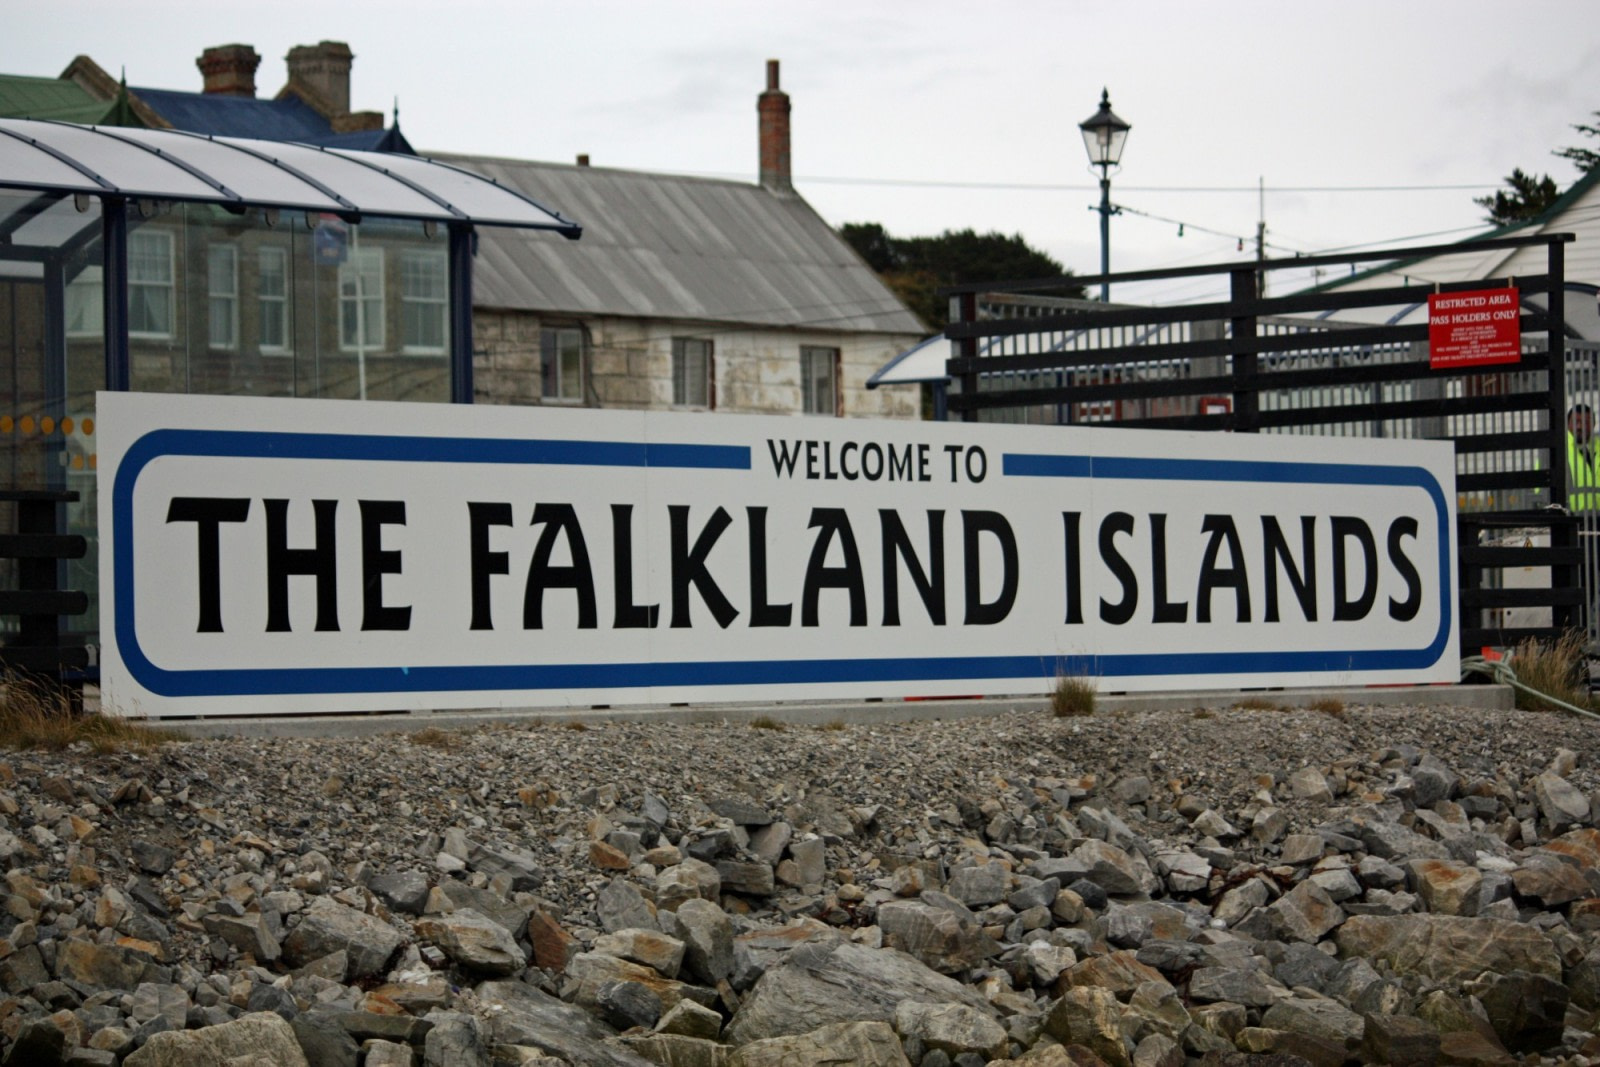 Falkland Islands history